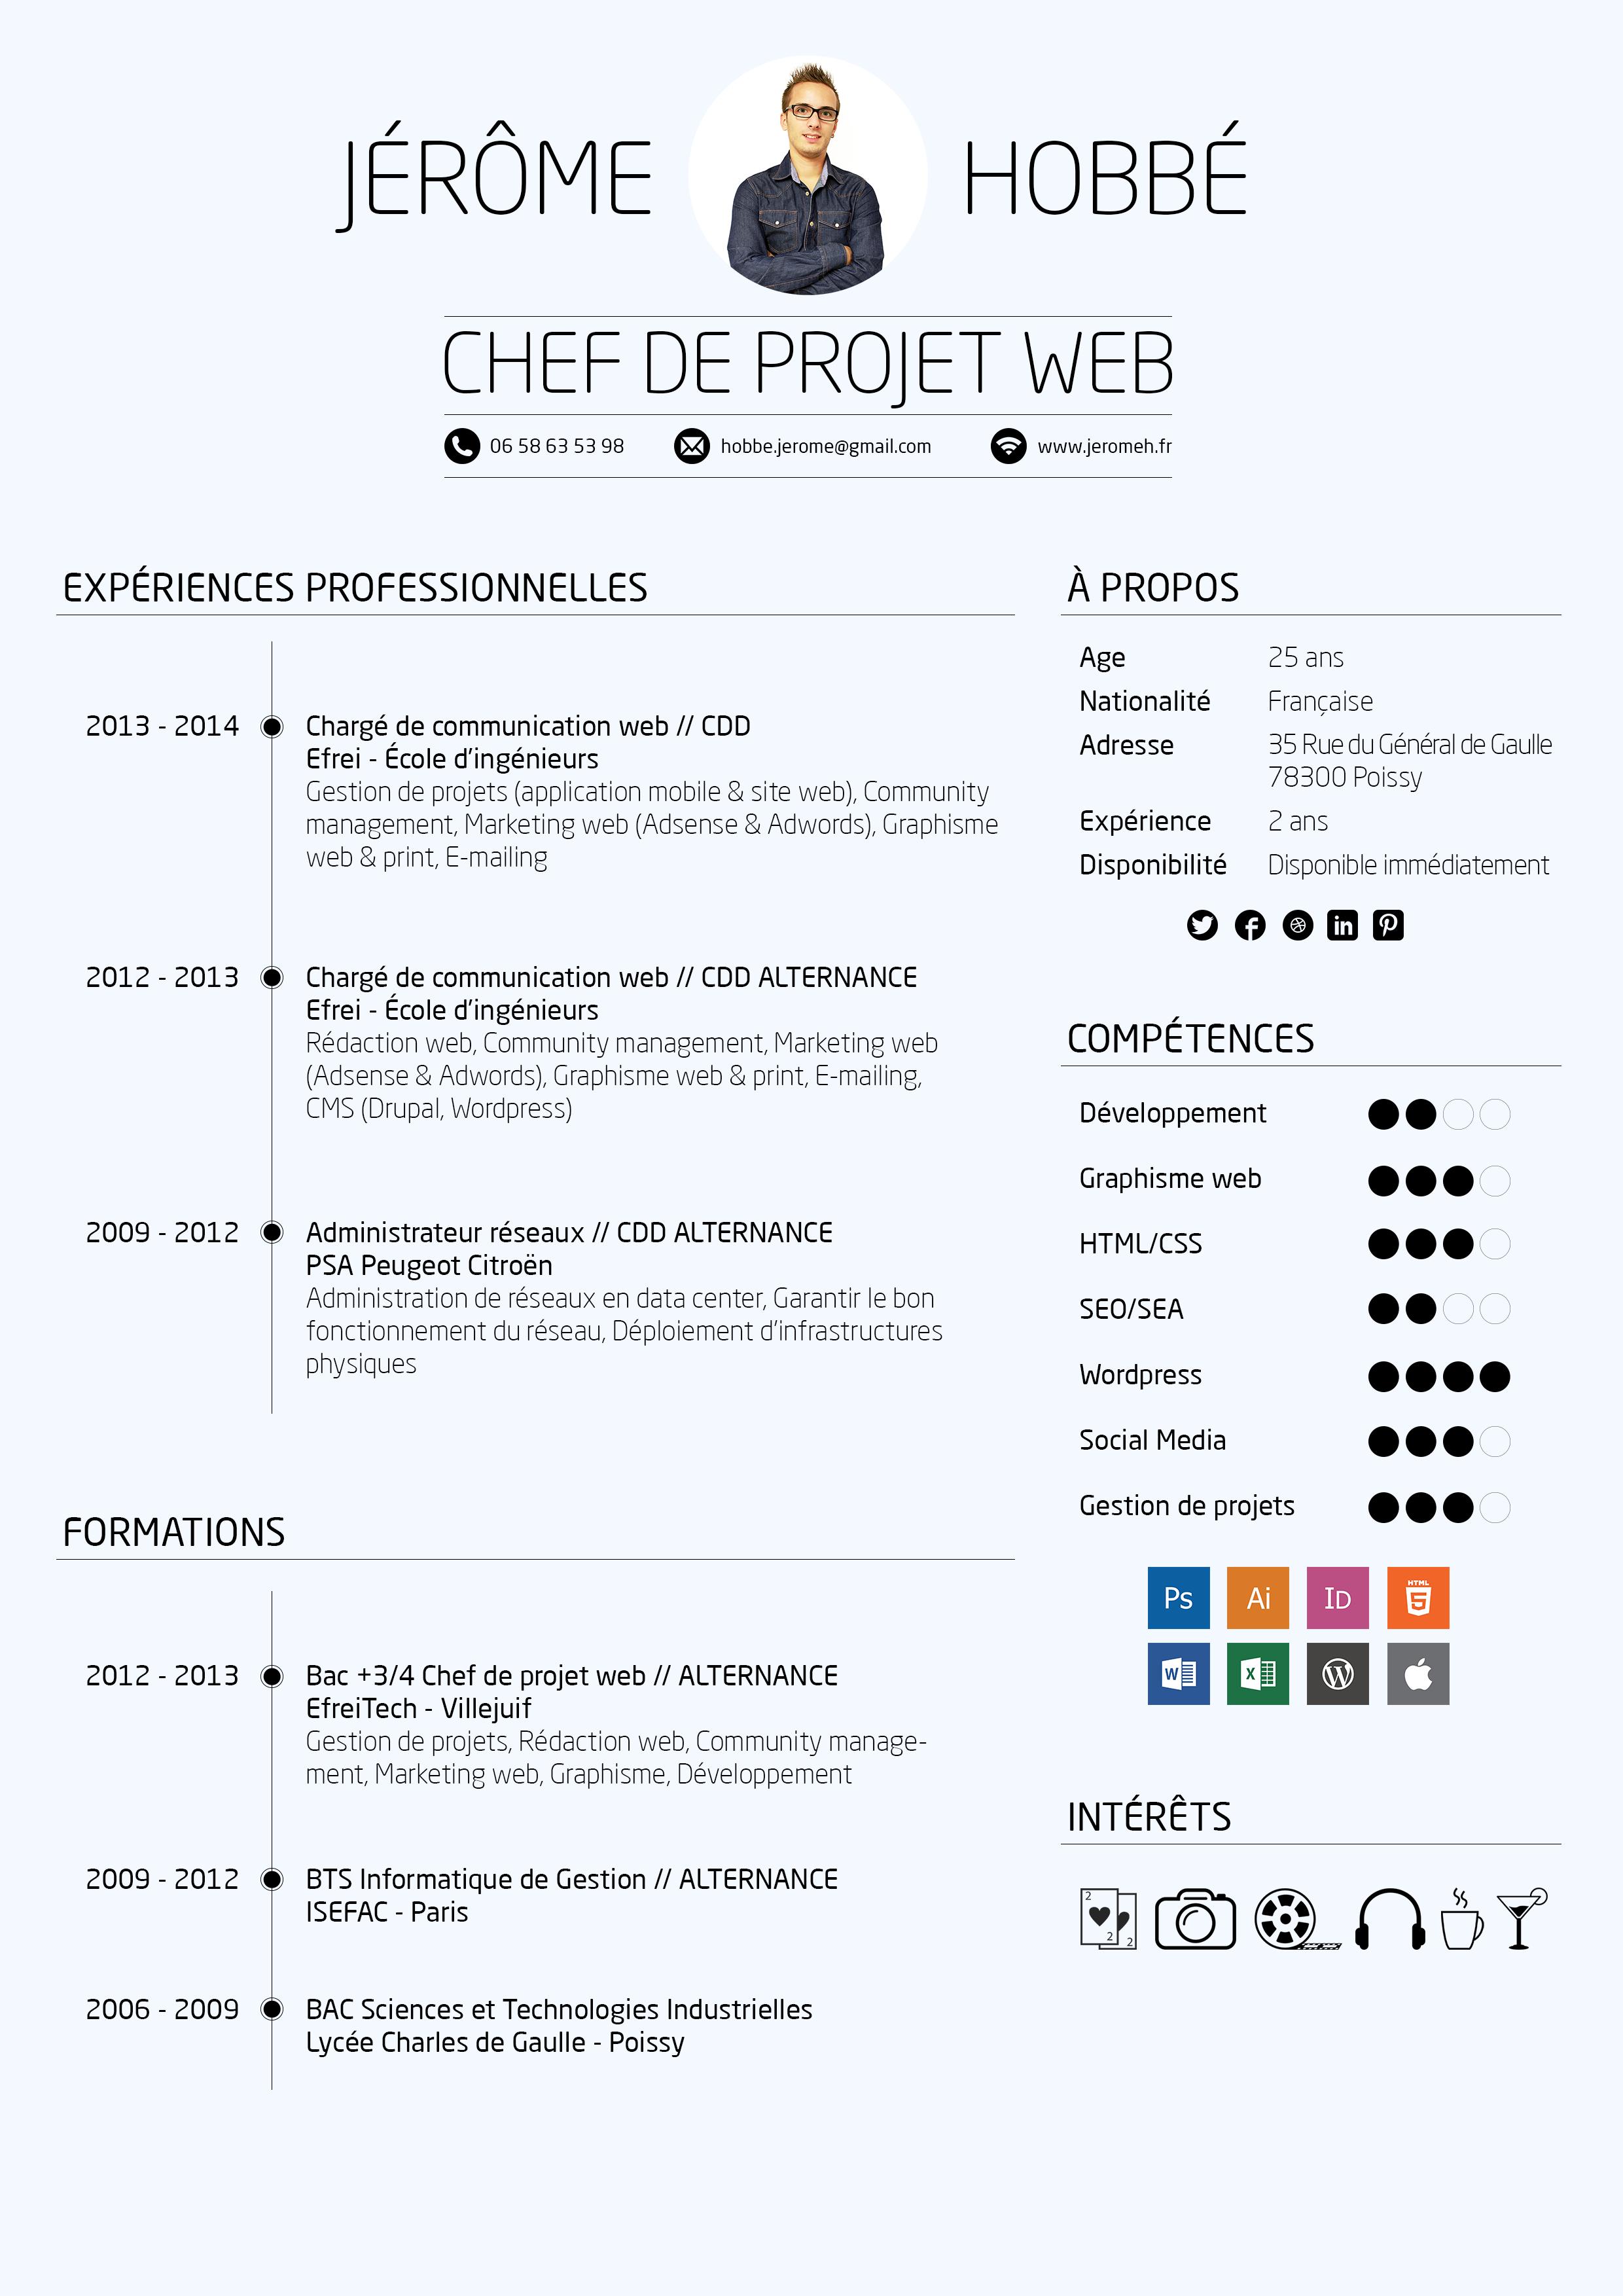 cv chef de projet web - Resume Informatique Bac Science